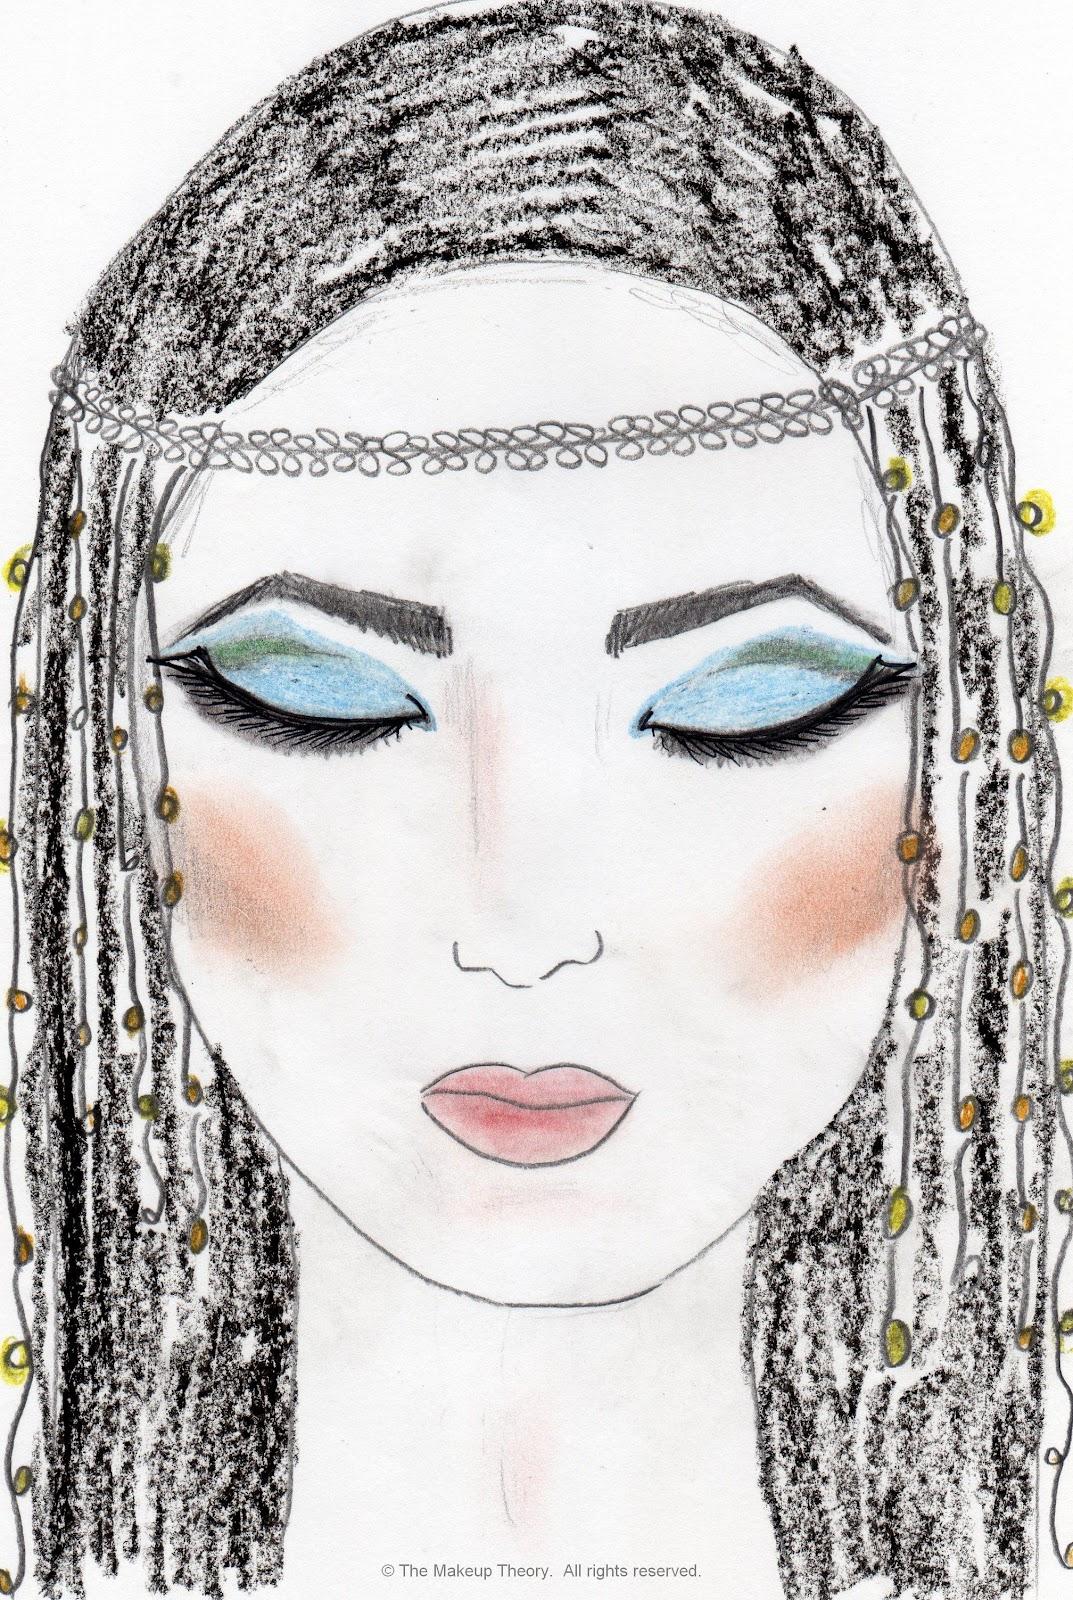 The Makeup Theory Studio: Makeup in History: Egyptian Makeup